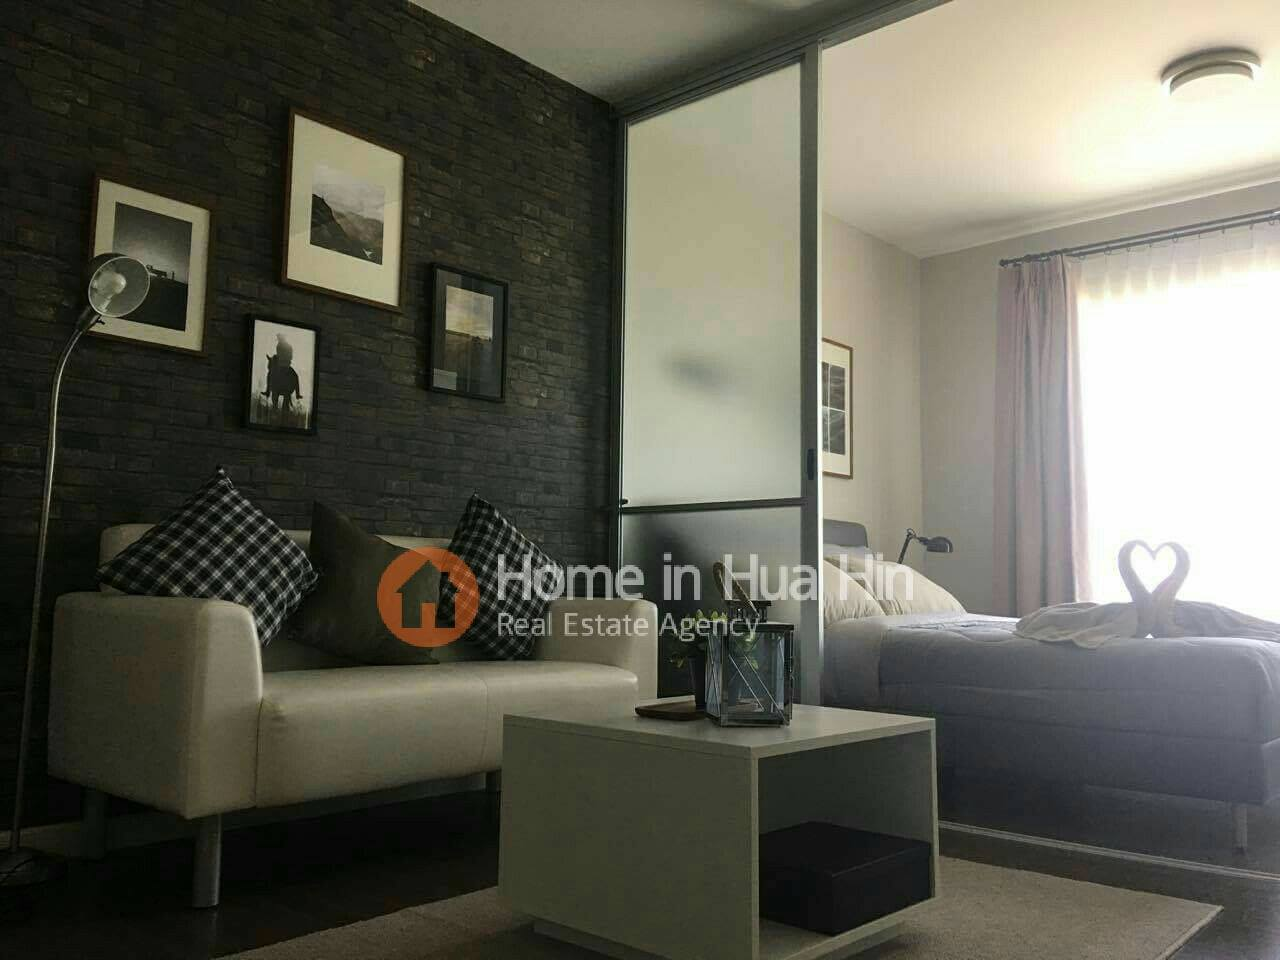 1 Bed Studio Apartment for Rent